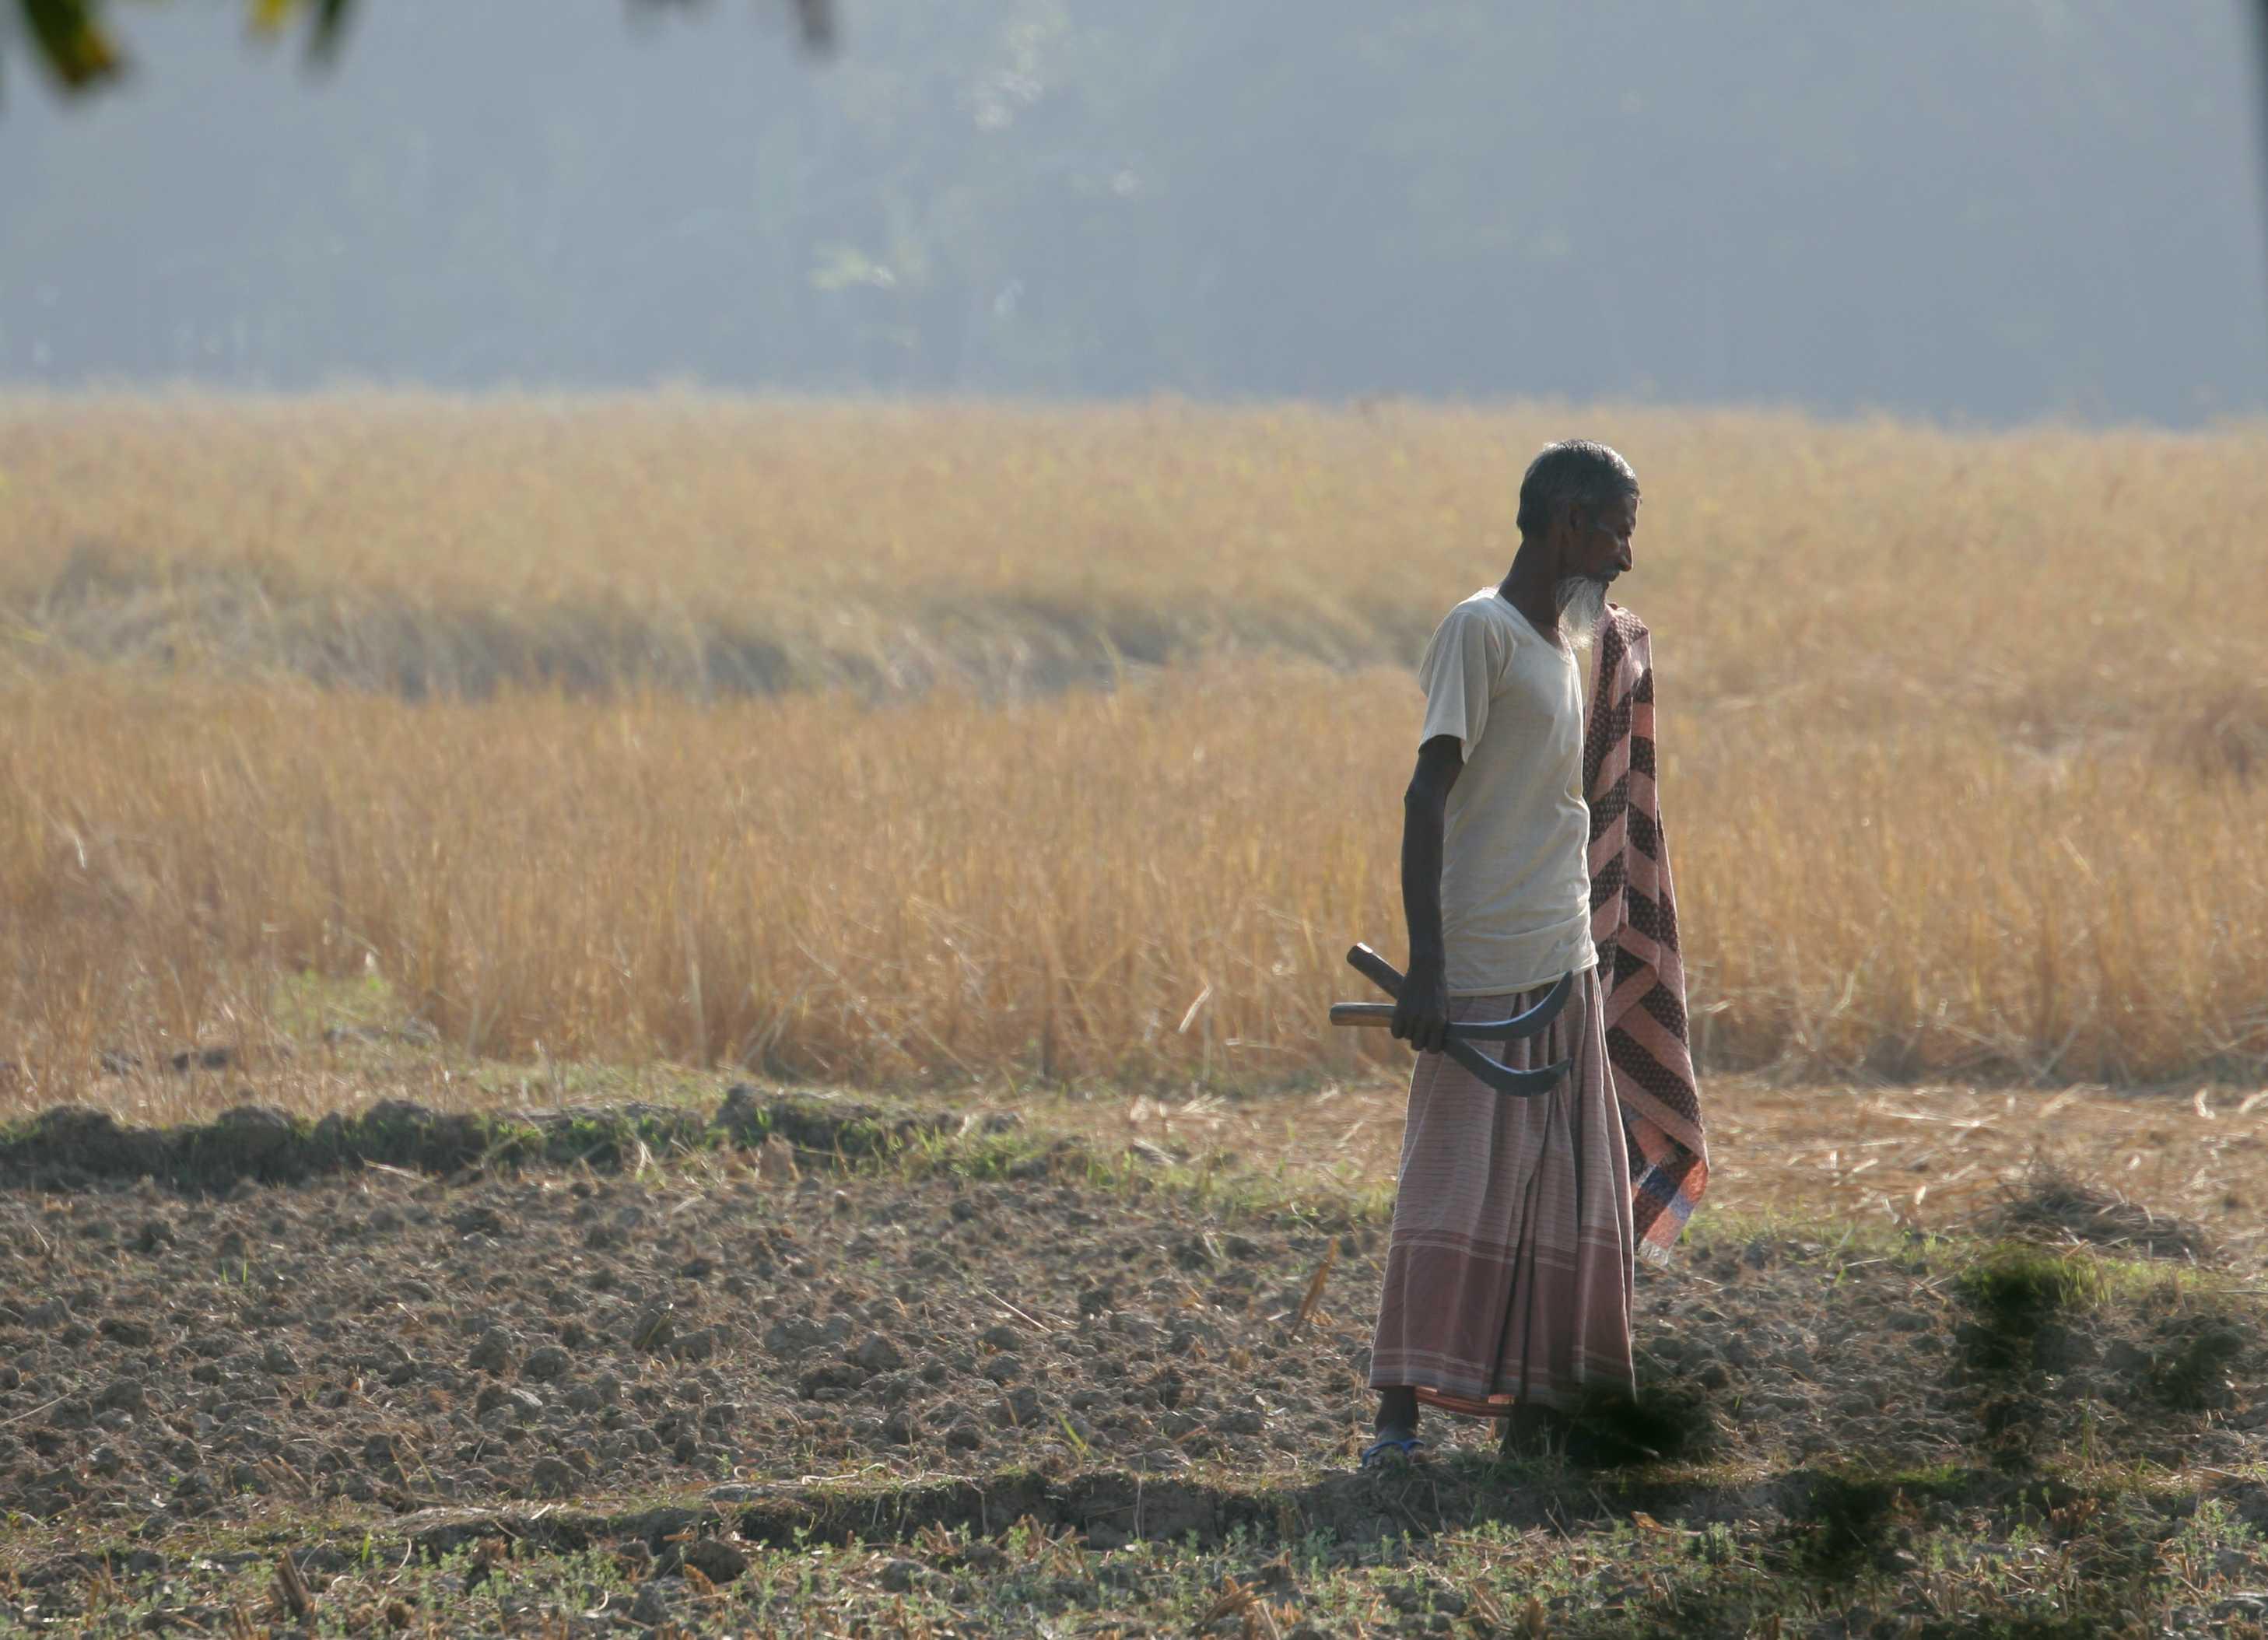 Bangladesh - Barisal rice farmer. Photo: ulricjoh, Flickr